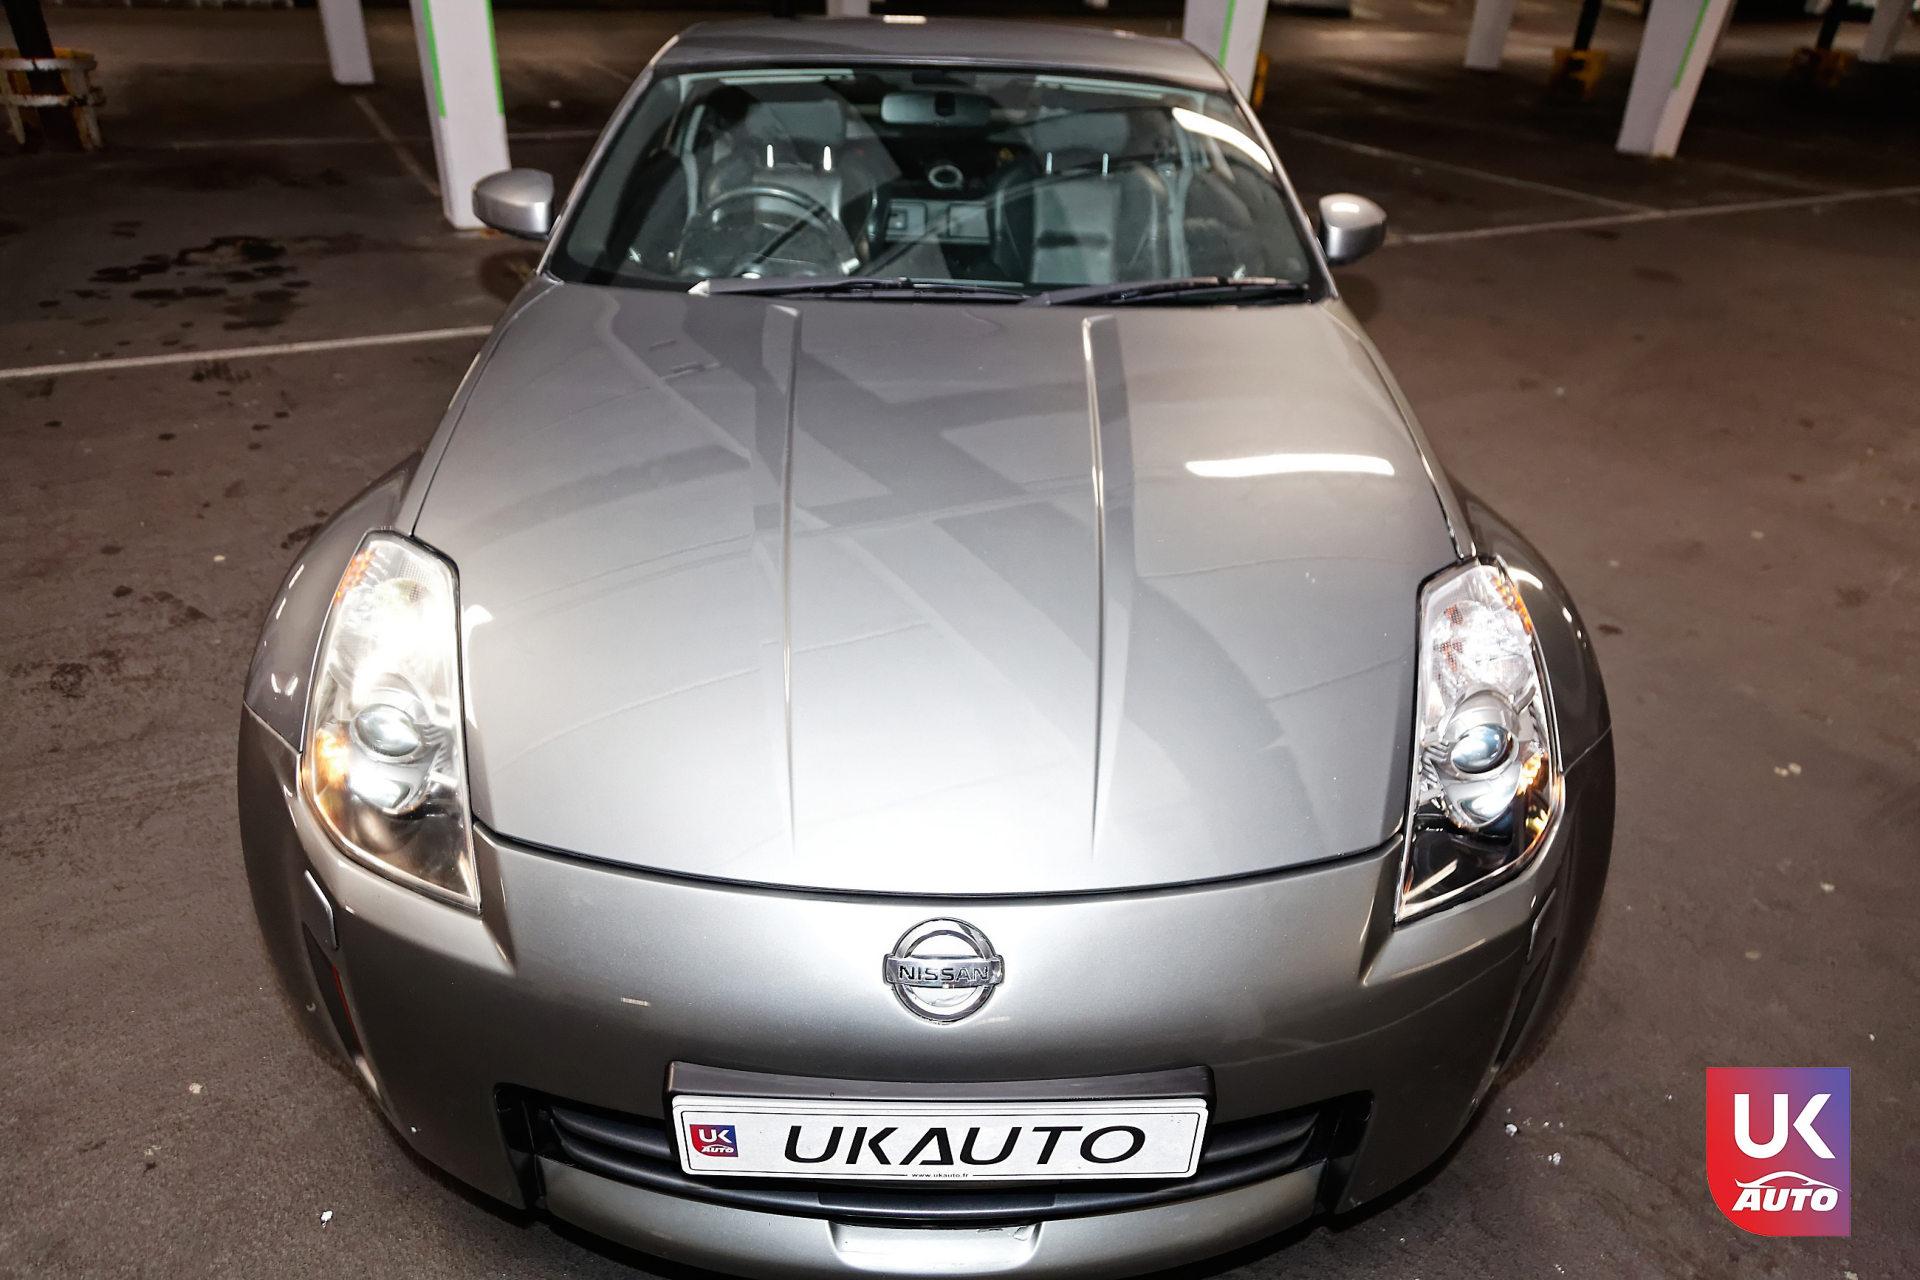 Nissan 350z rhd v6 nissan angleterre nissan uk nissan import rhd voiture occasion mandataire nissan 5 DxO - NISSAN ANGLETERRE IMPORT NISSAN 350Z V6 RHD 3.5 MANDATAIRE NISSAN AUTO AVANT LE BREXIT FELICITATION A XABI